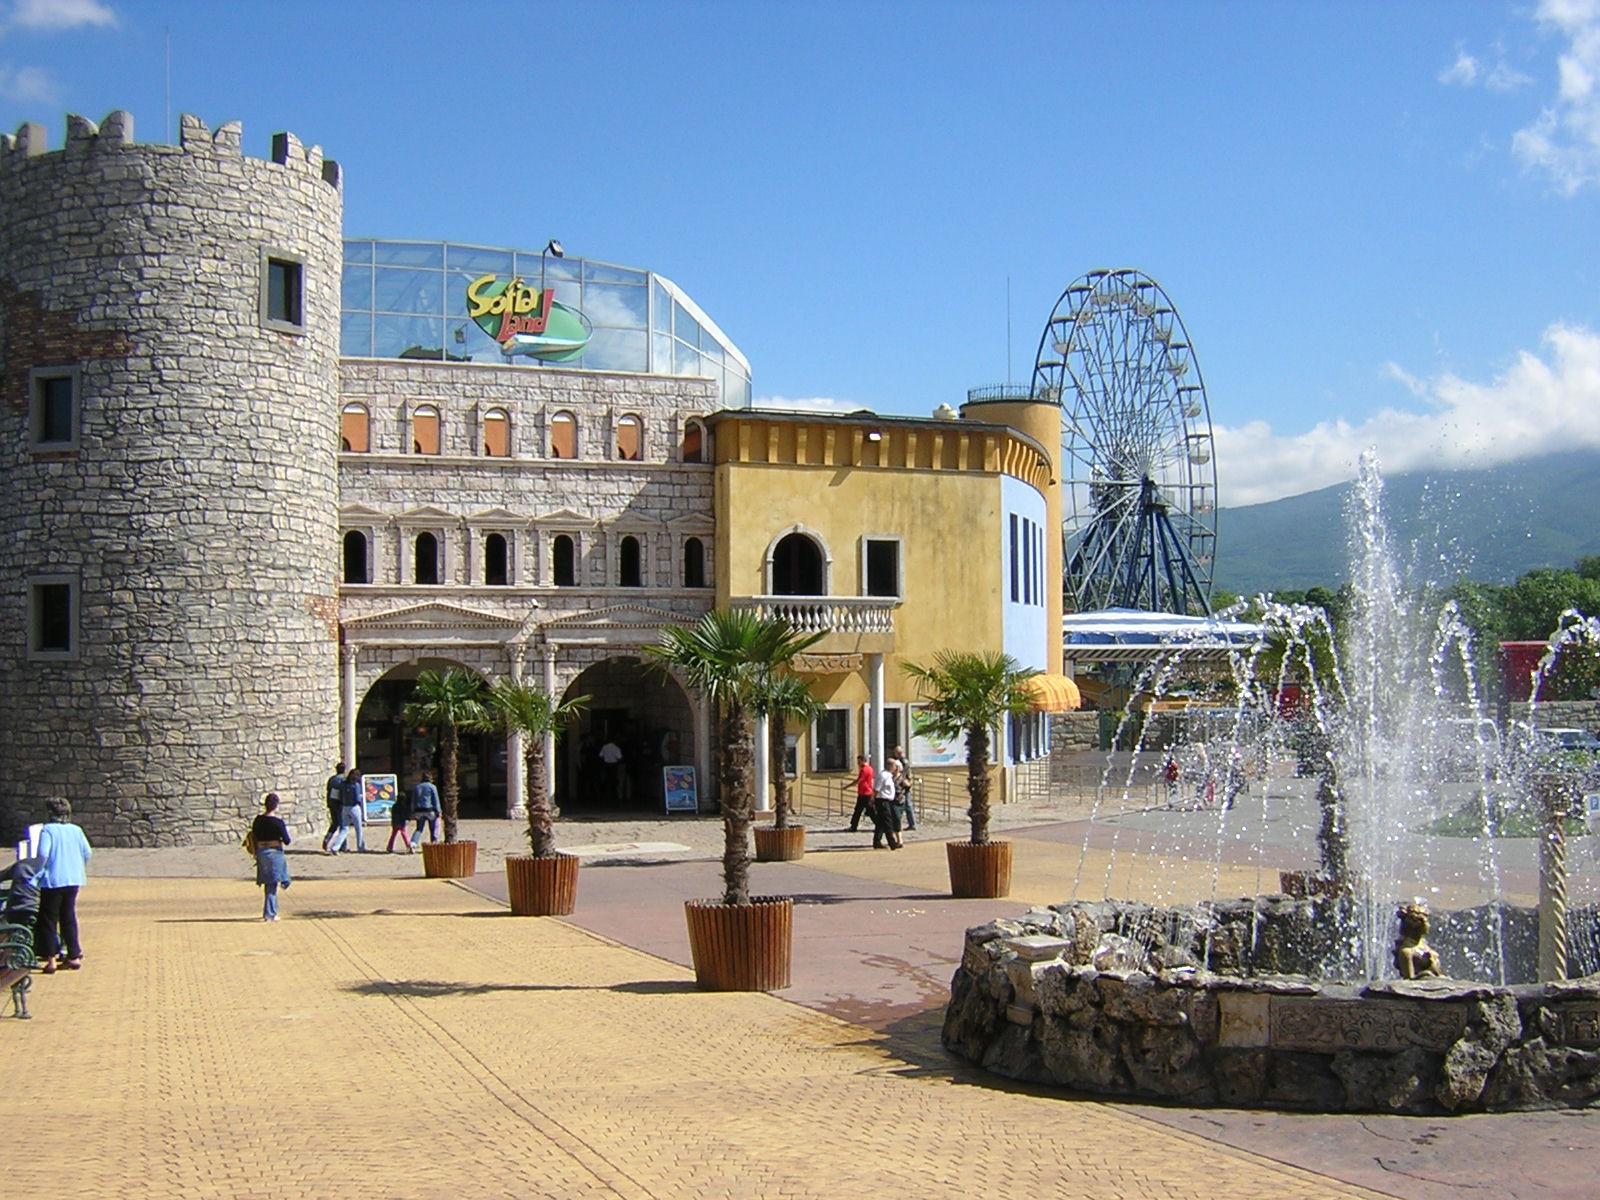 File:Sofia land entrance.JPG